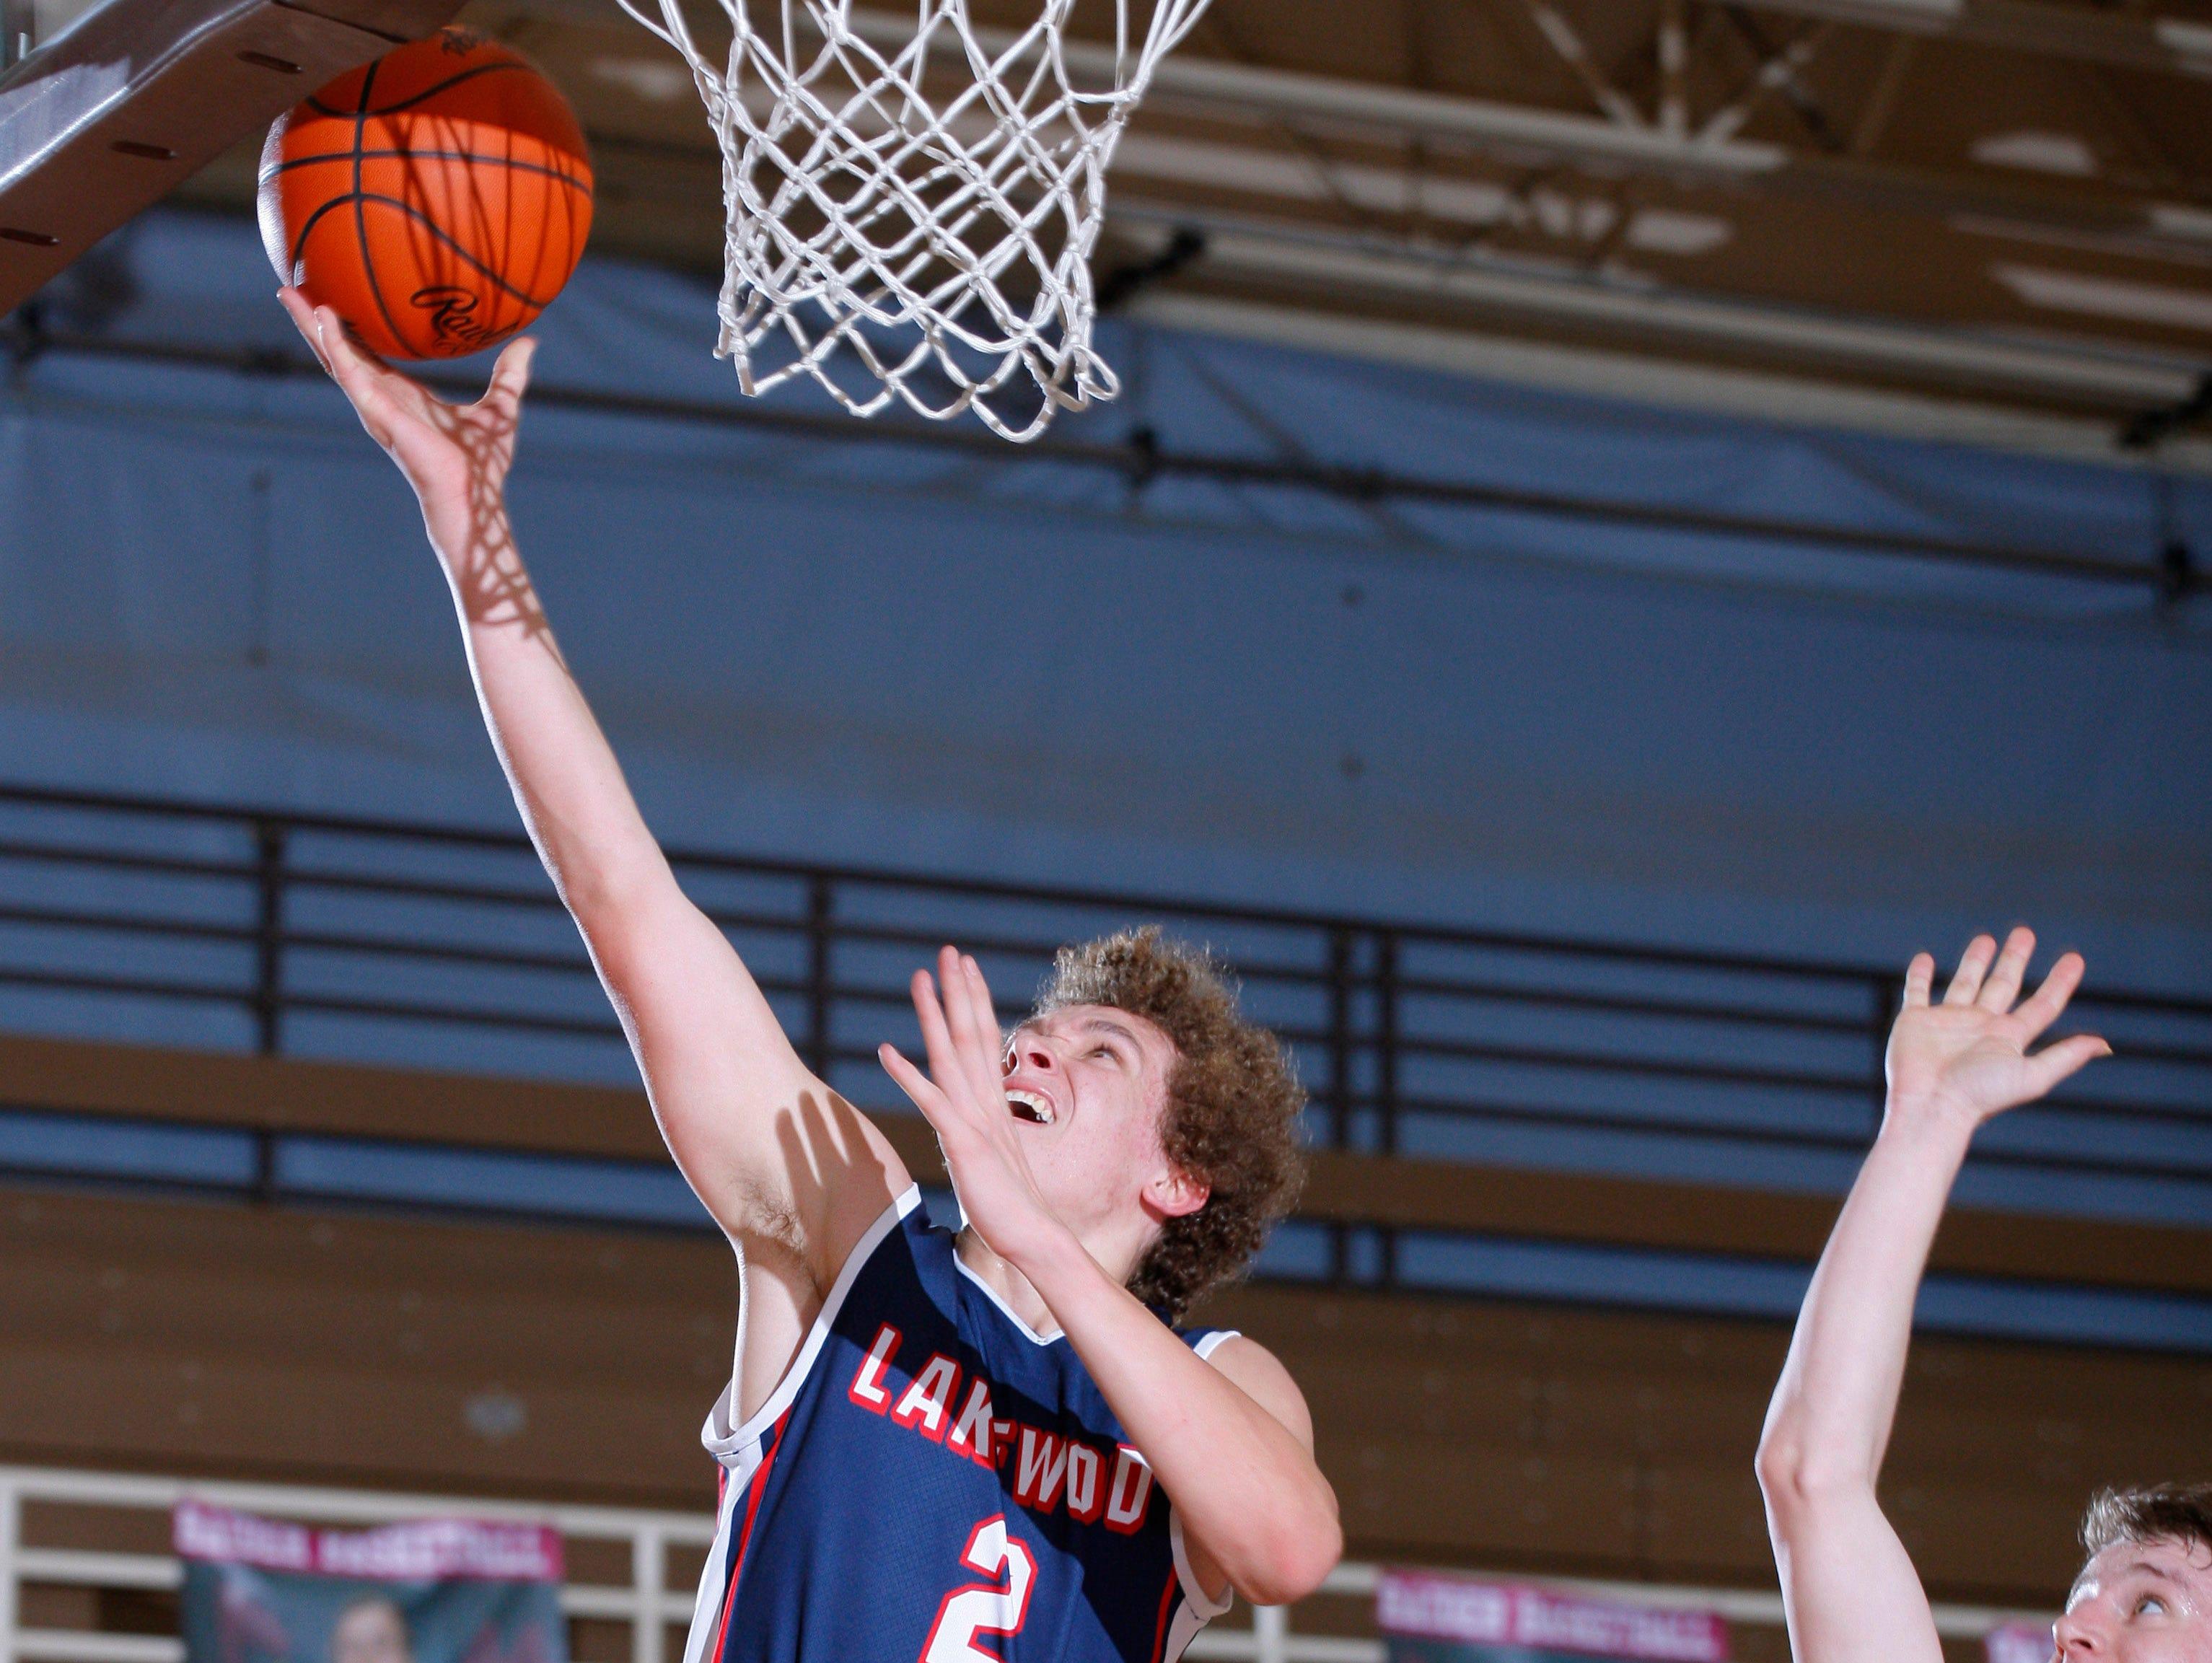 Lakewood's Josh Campeau (2) gets a layup against Portland's Brett Pung, center, and Bobby Brandsen, right, Tuesday, Jan. 31, 2017, at Portland High School. Portland won 53-44.